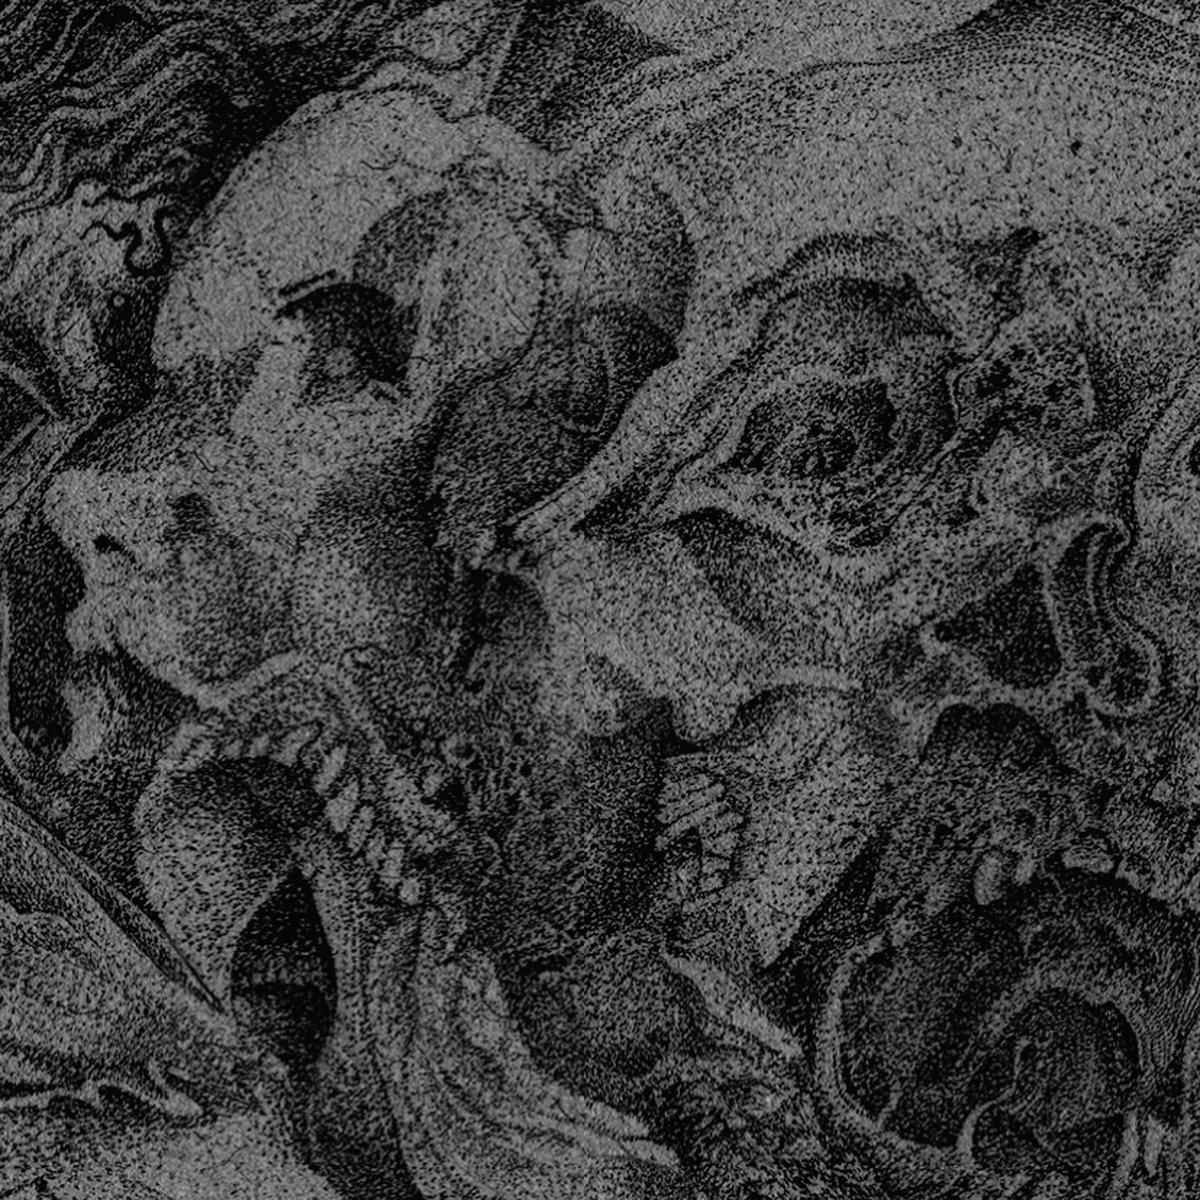 RealmOfMetal org - Latest Metal Album Releases